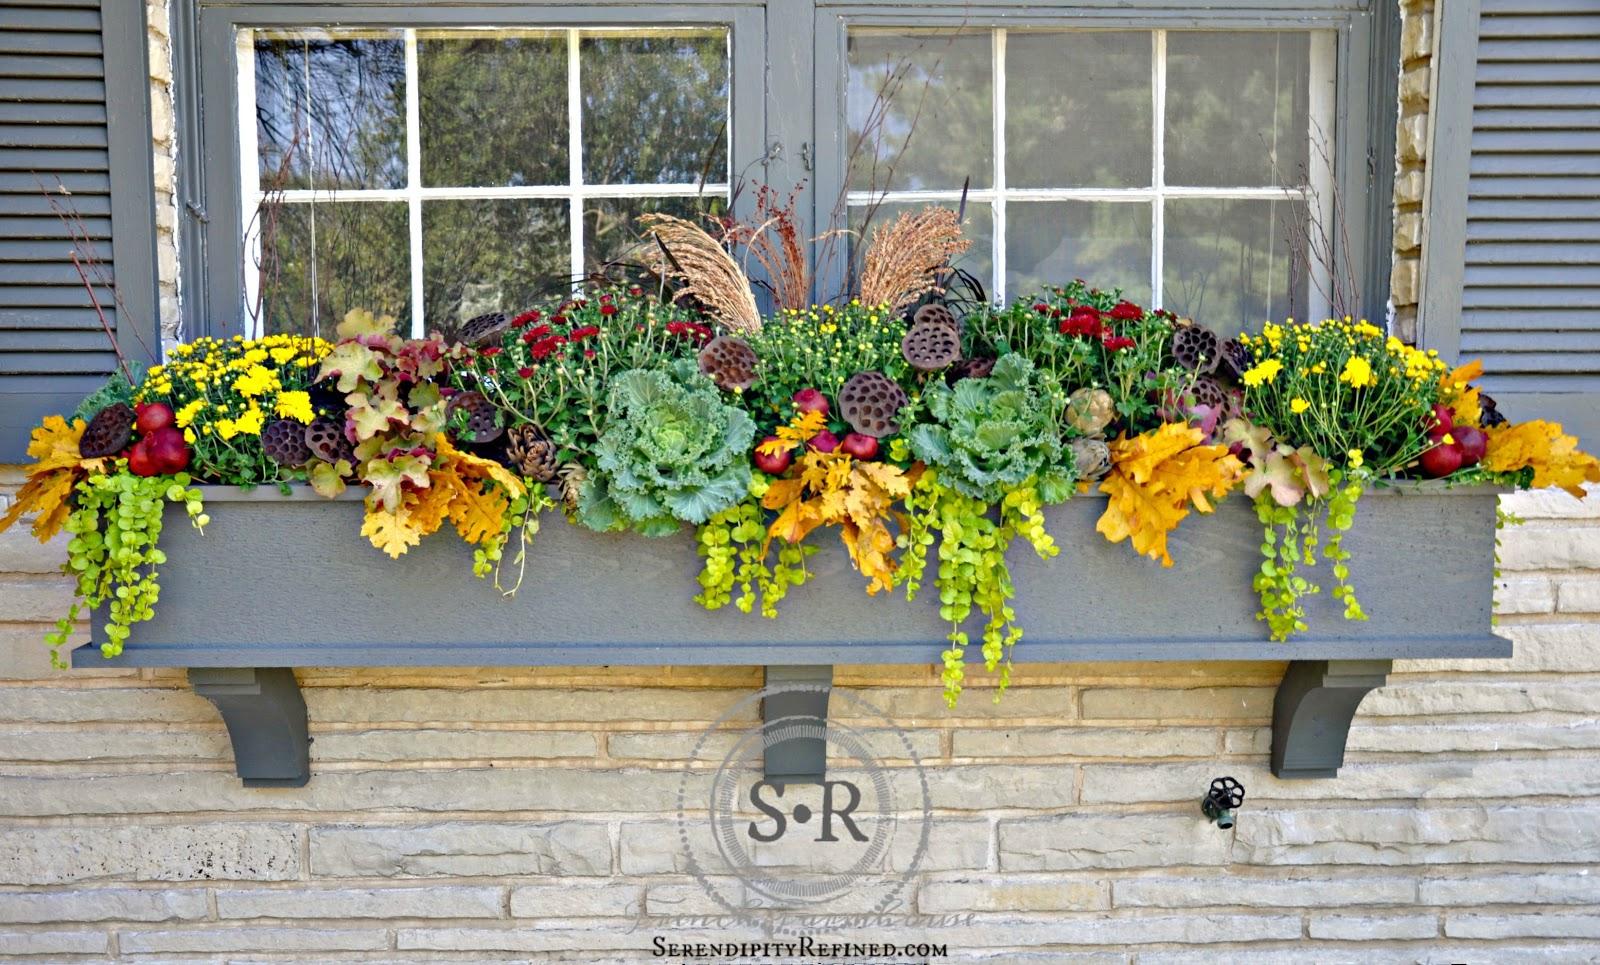 & Serendipity Refined Blog: Fall Window Box Planter